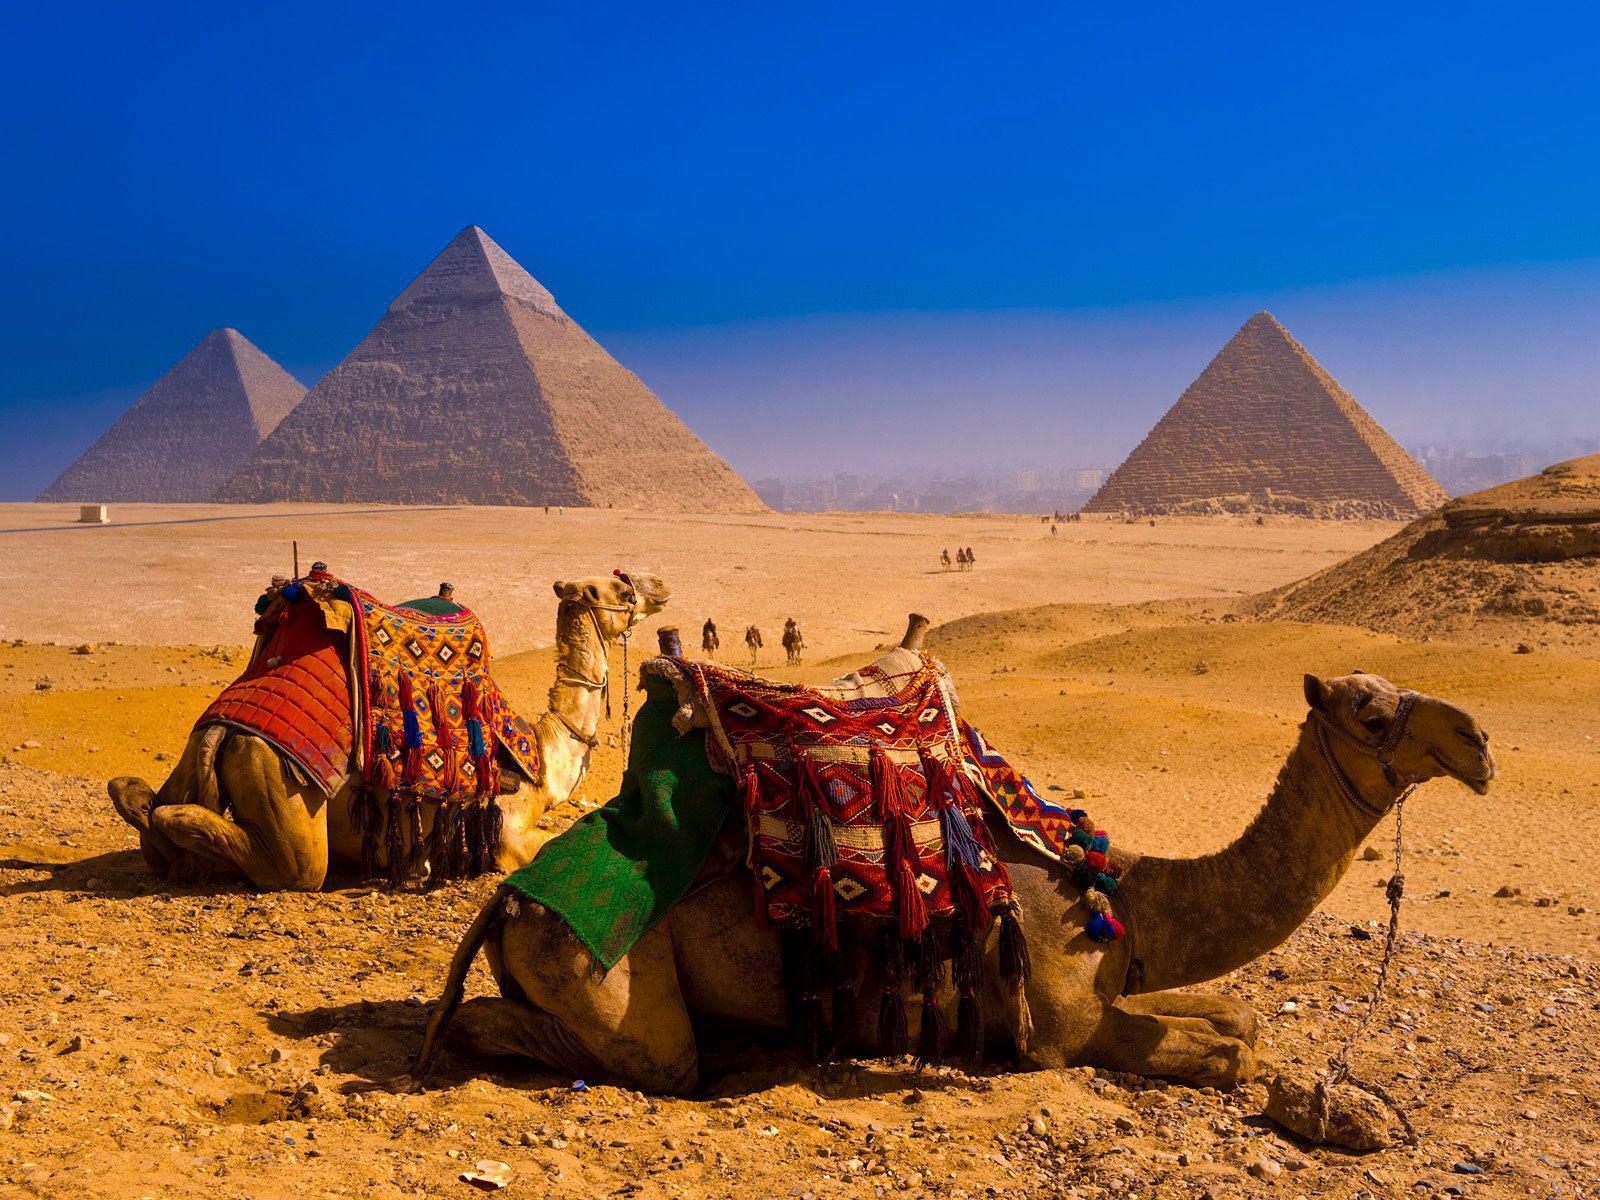 Giza Plateau, Egypt photo on Sunsurfer: sun-surfer.com/giza-plateau-egypt-6601.html